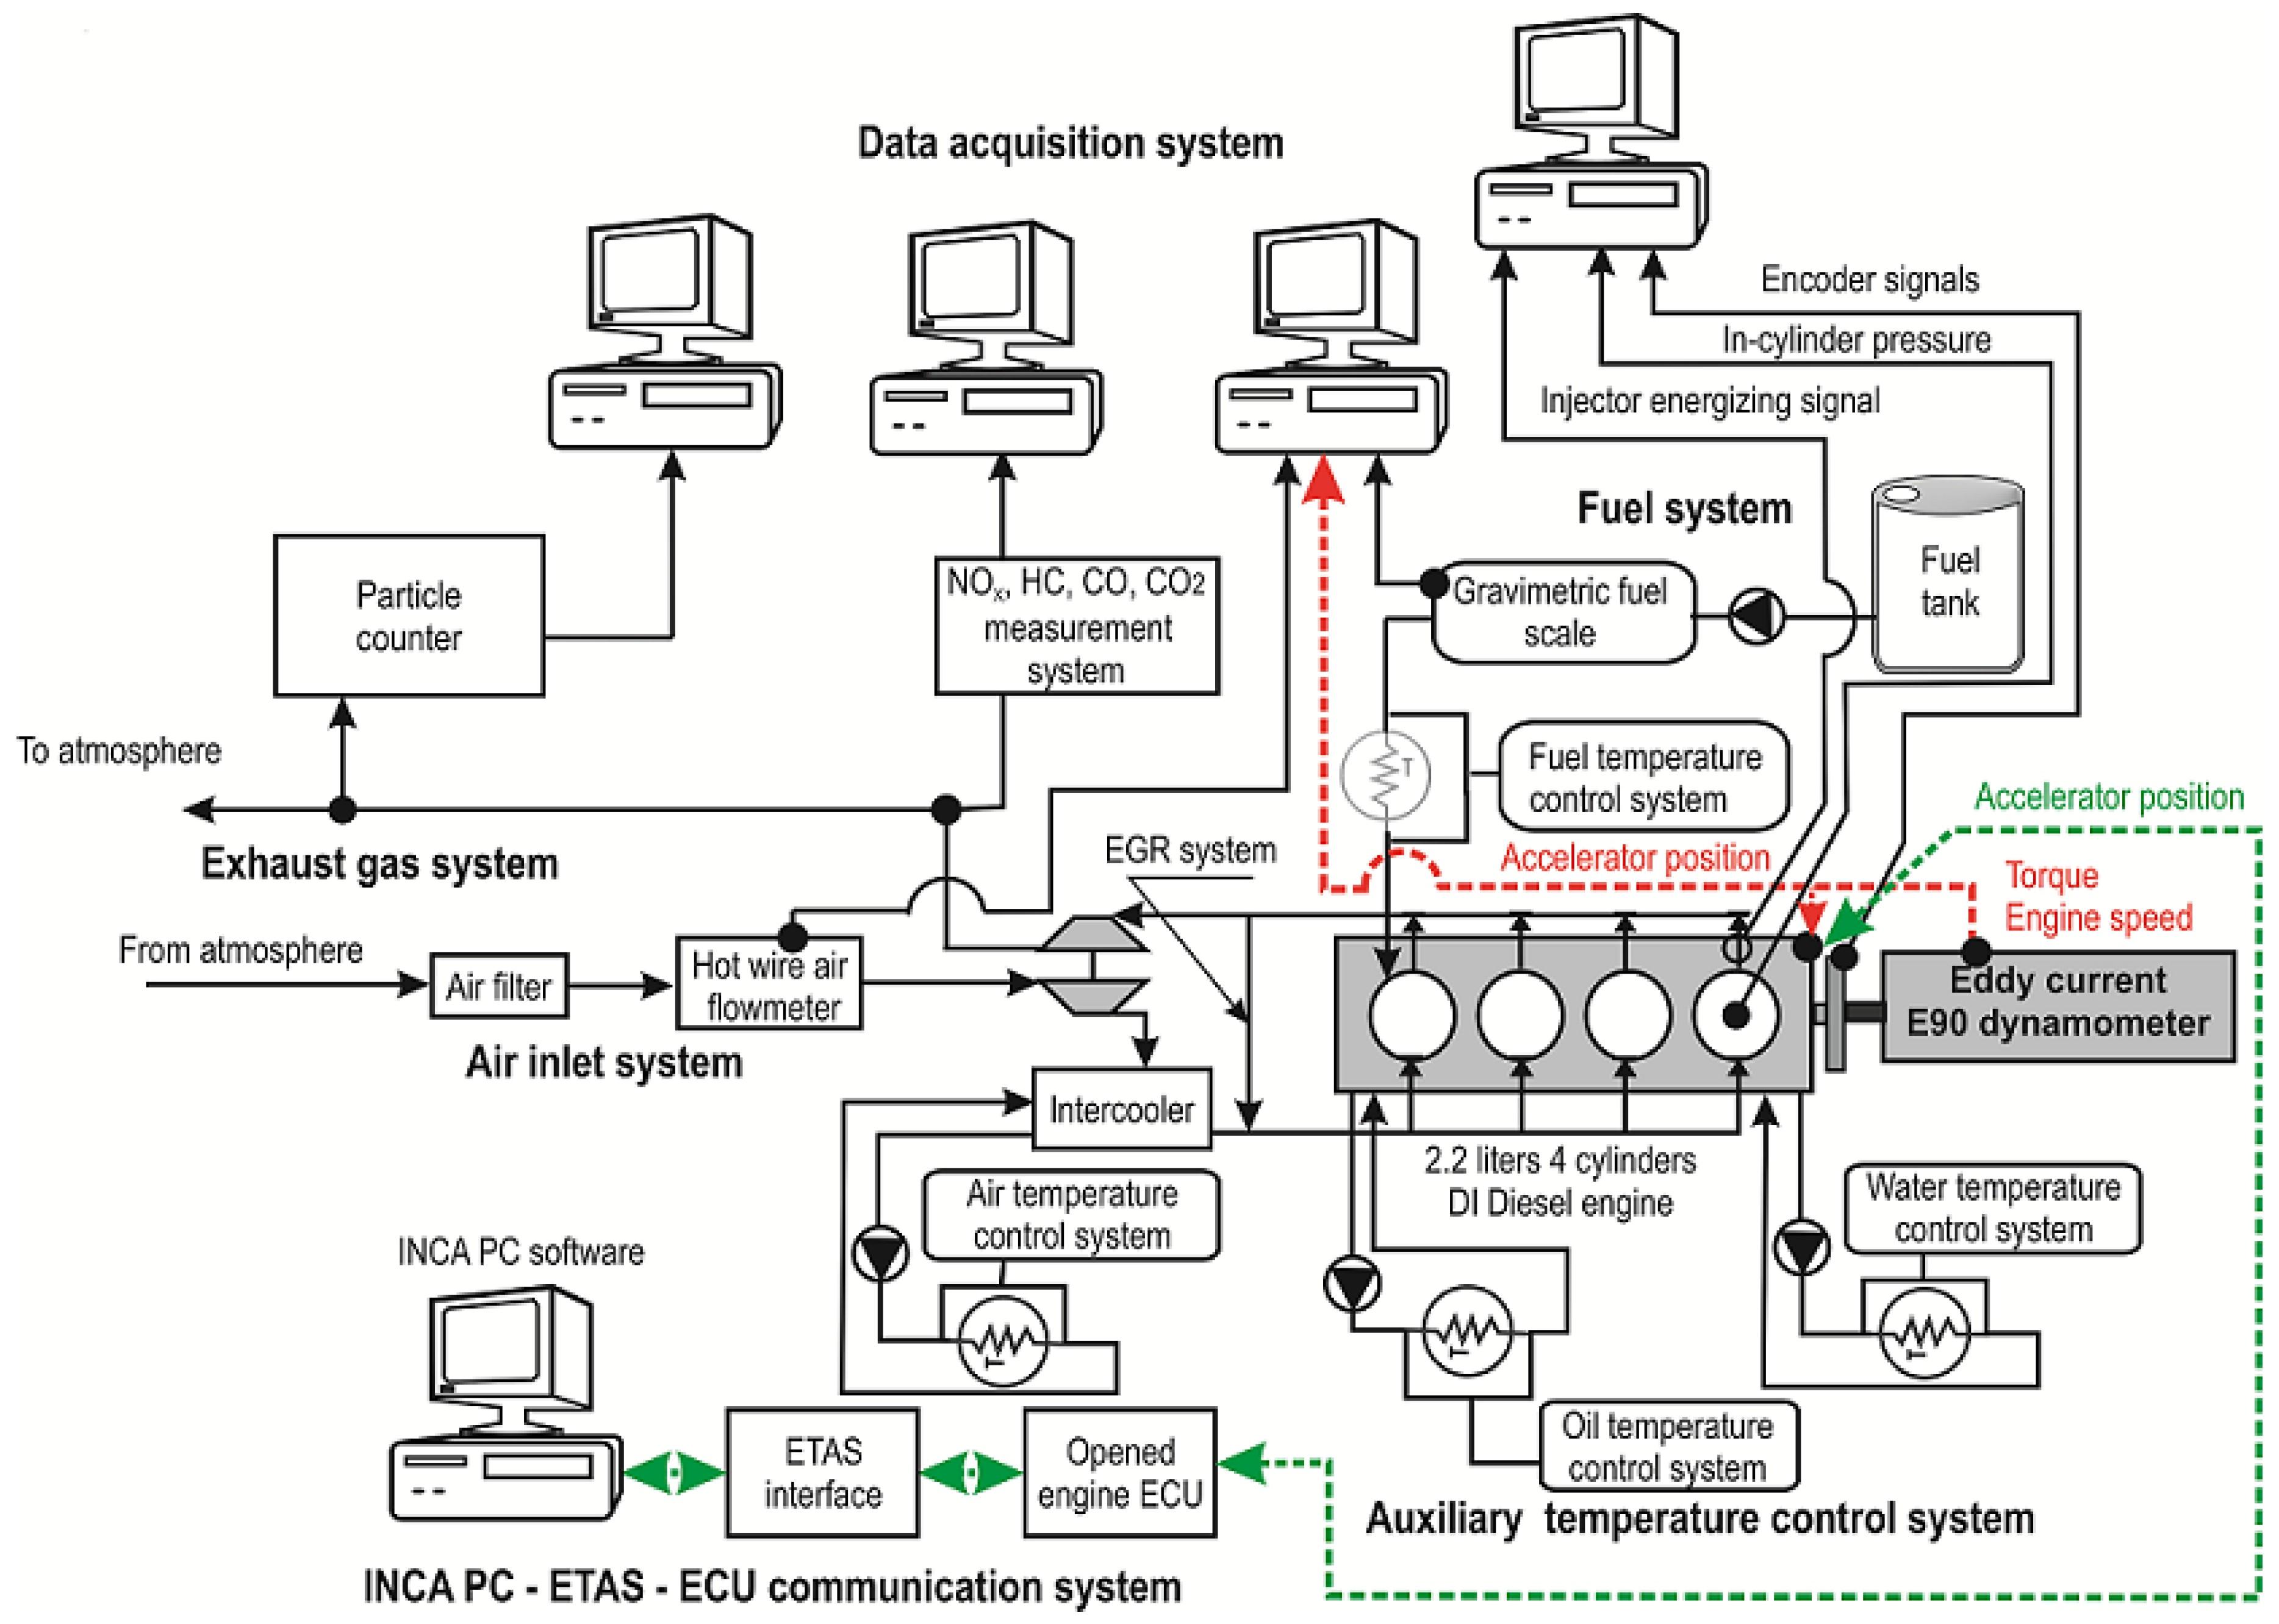 Diagram Of Engines Energies Of Diagram Of Engines